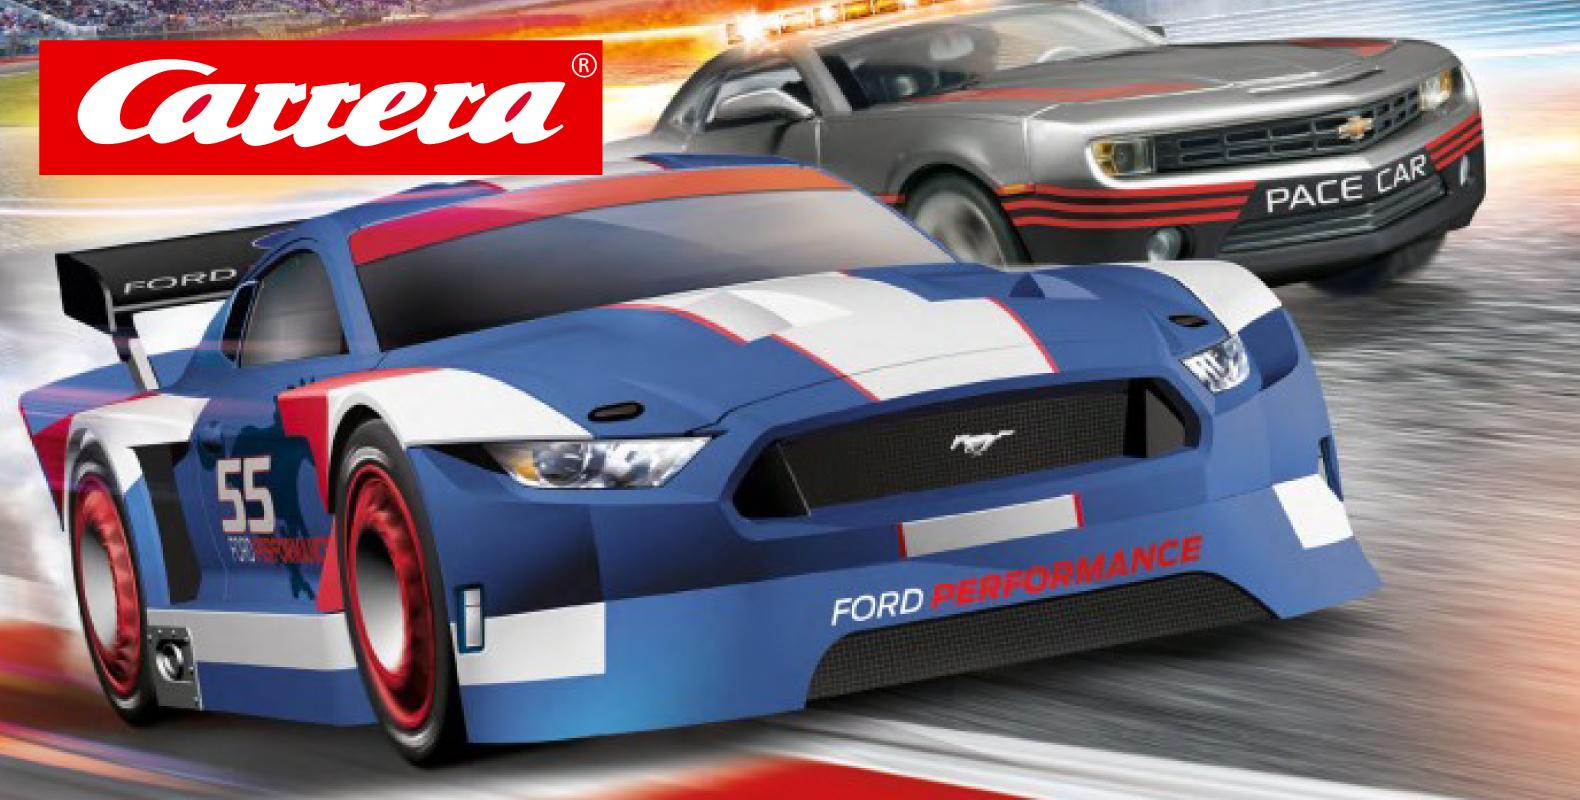 carrera new cars and sets 10.20.20